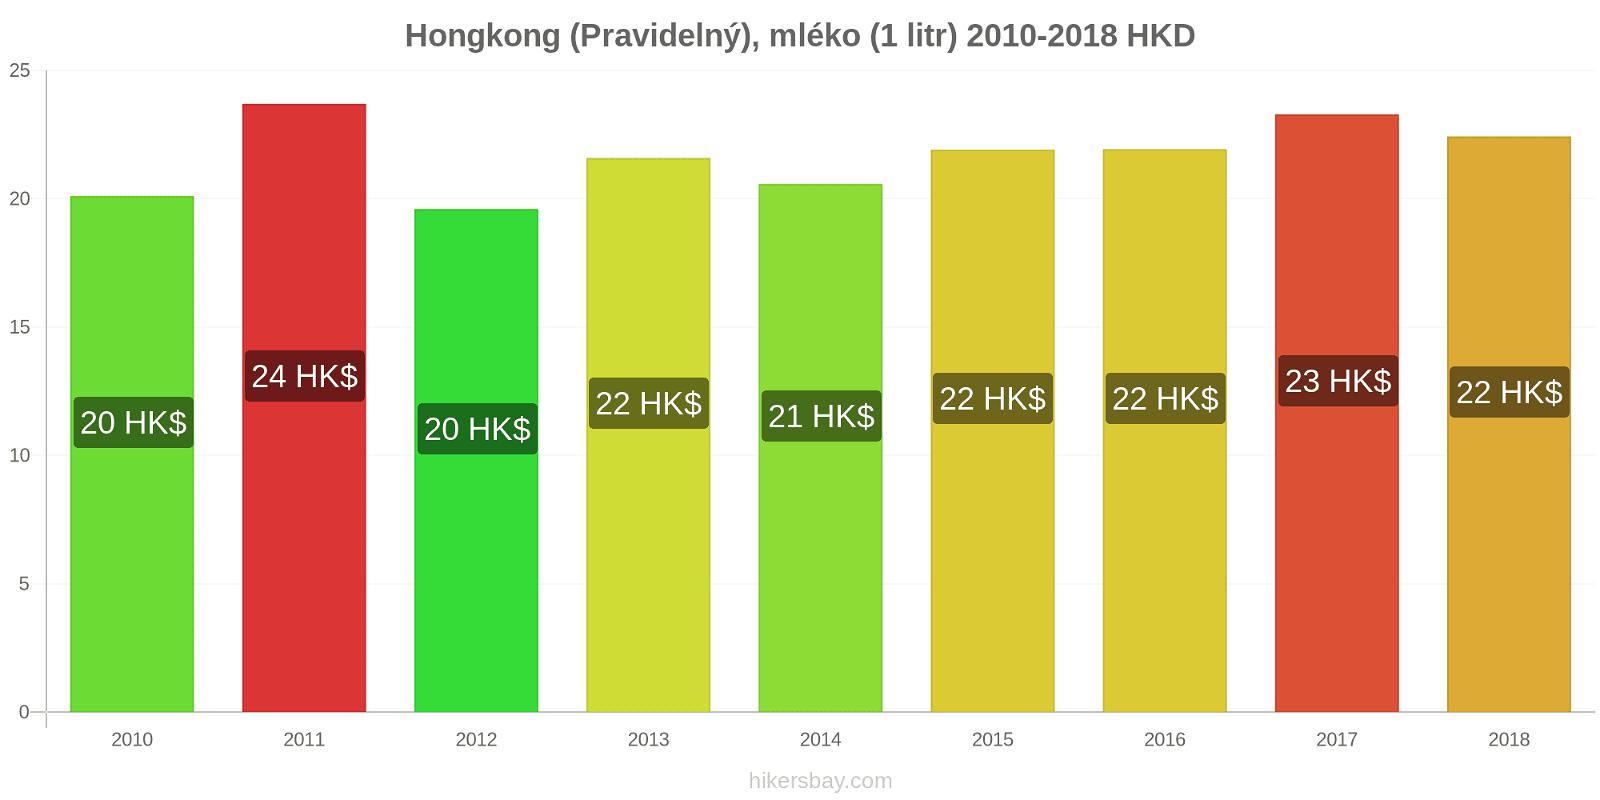 Hongkong změny cen (Pravidelný), mléko (1 litr) hikersbay.com